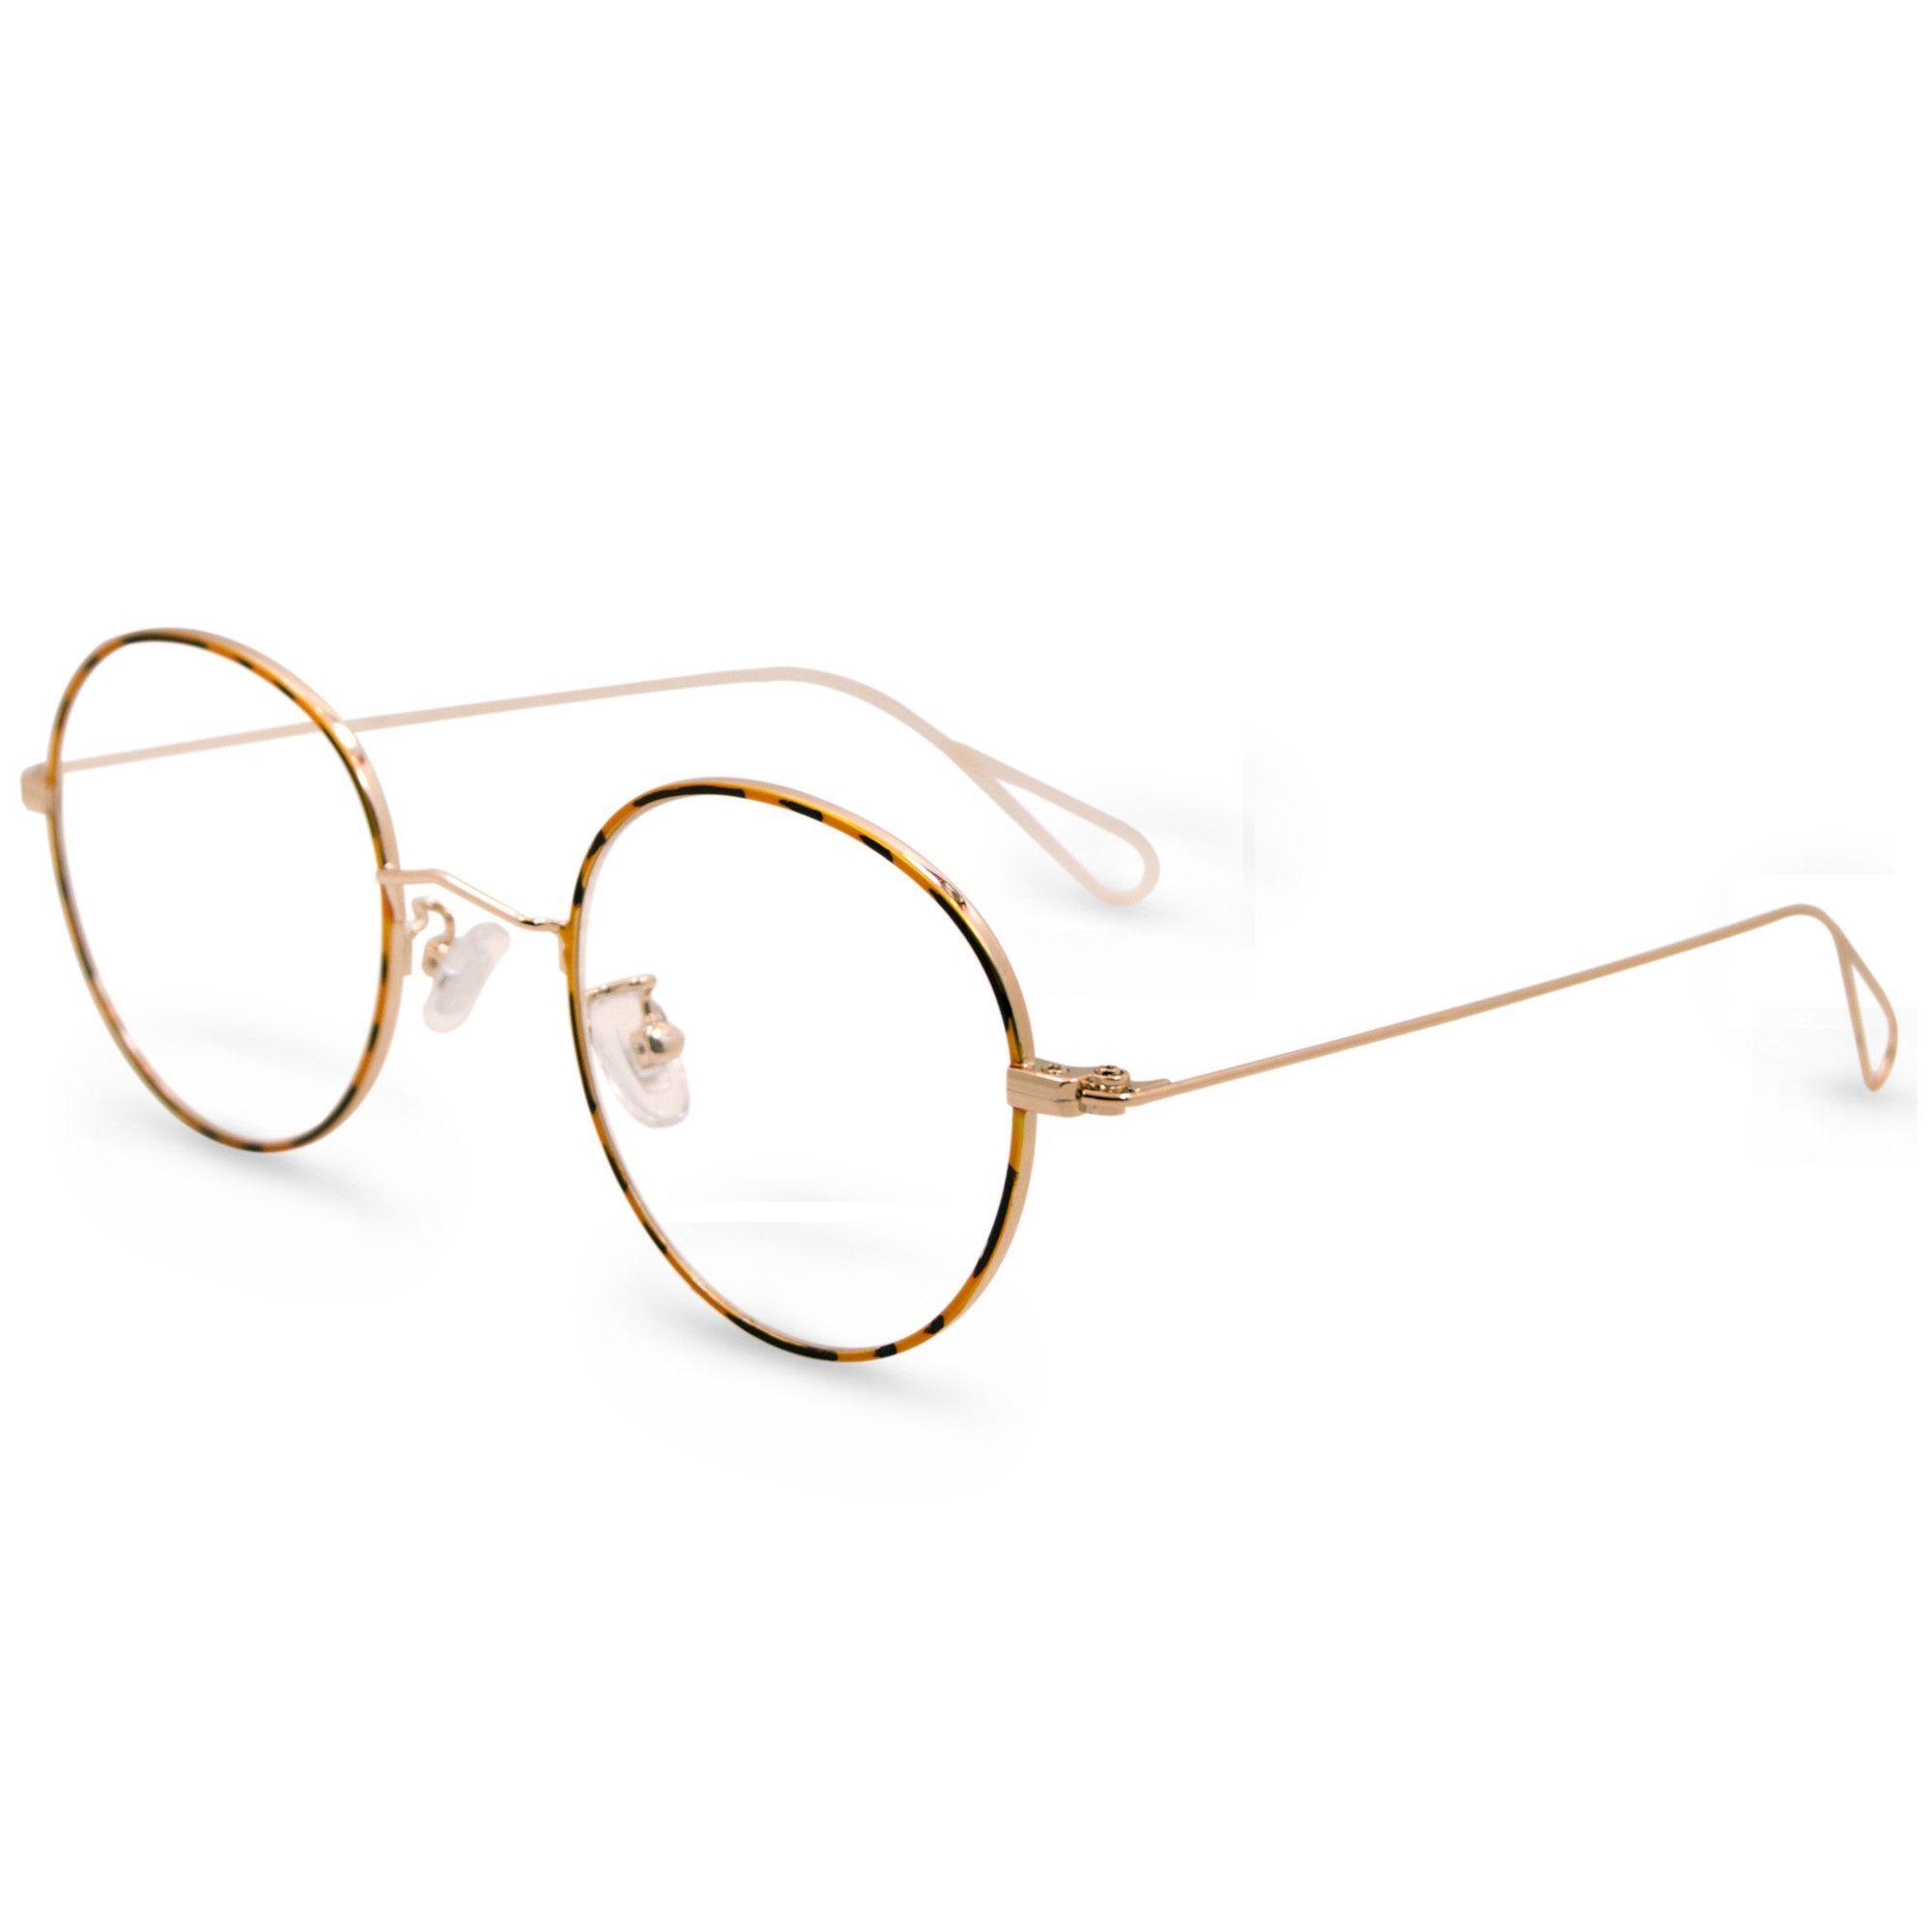 RX-Able Round Reading Glasses with Prescription Eyeglass Frames ... 6b2e855dd509